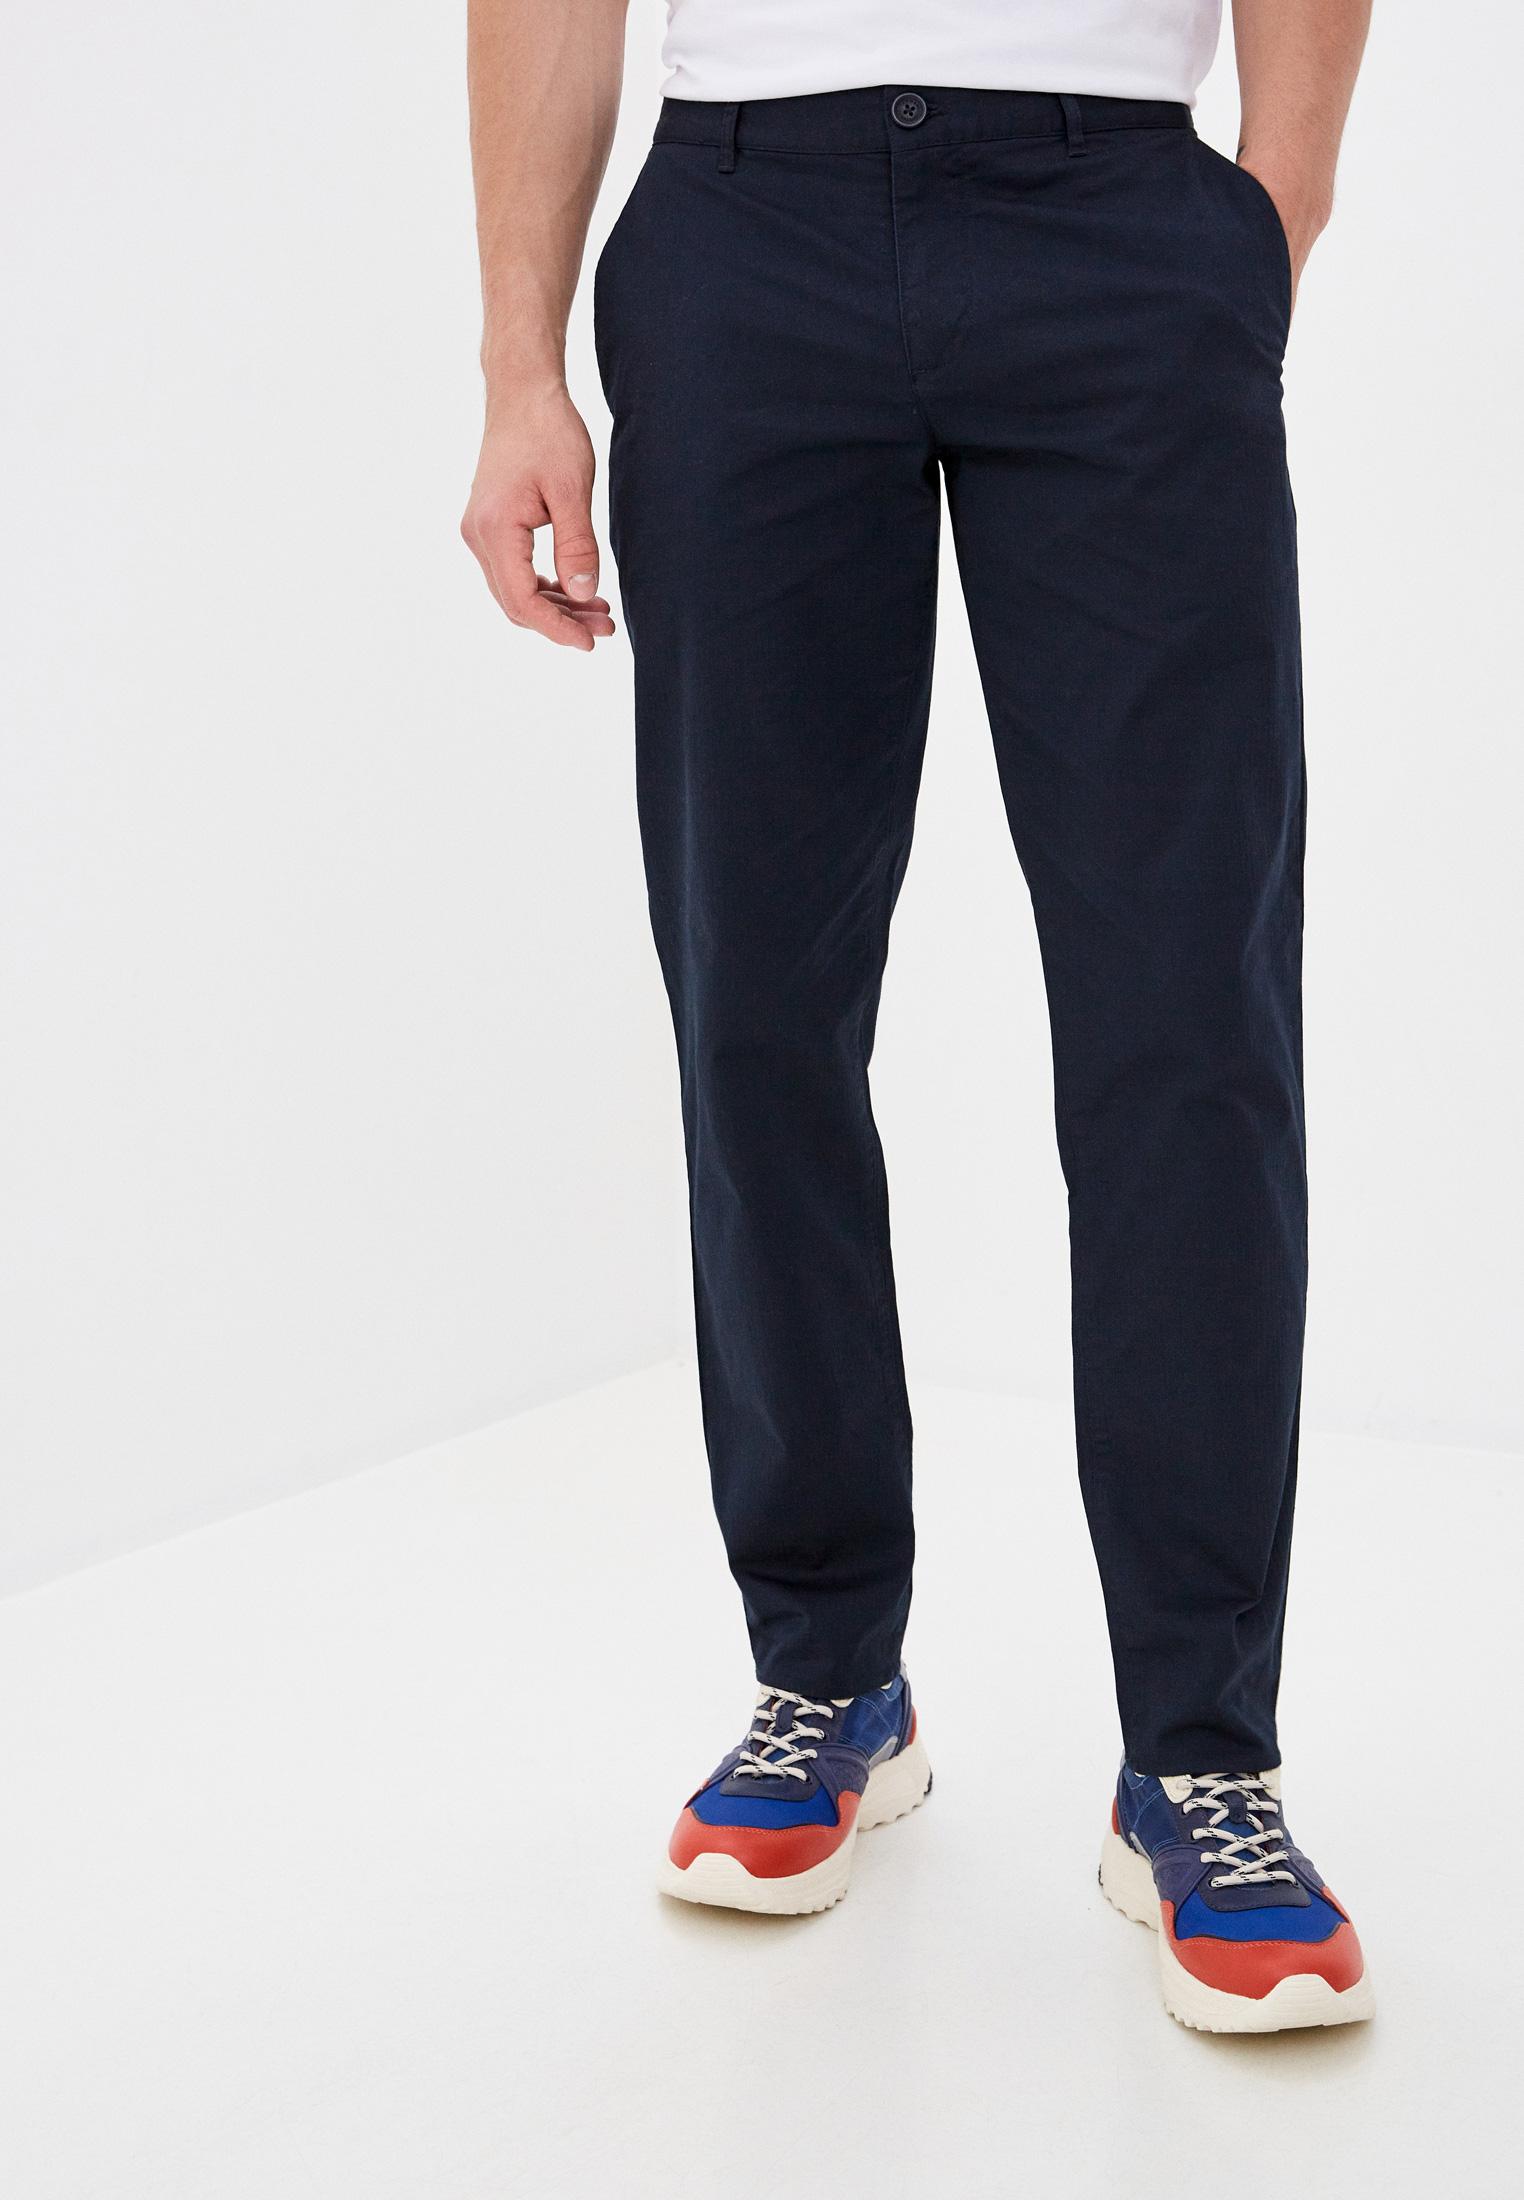 Мужские брюки Armani Exchange 6hzp22 ZNPNZ